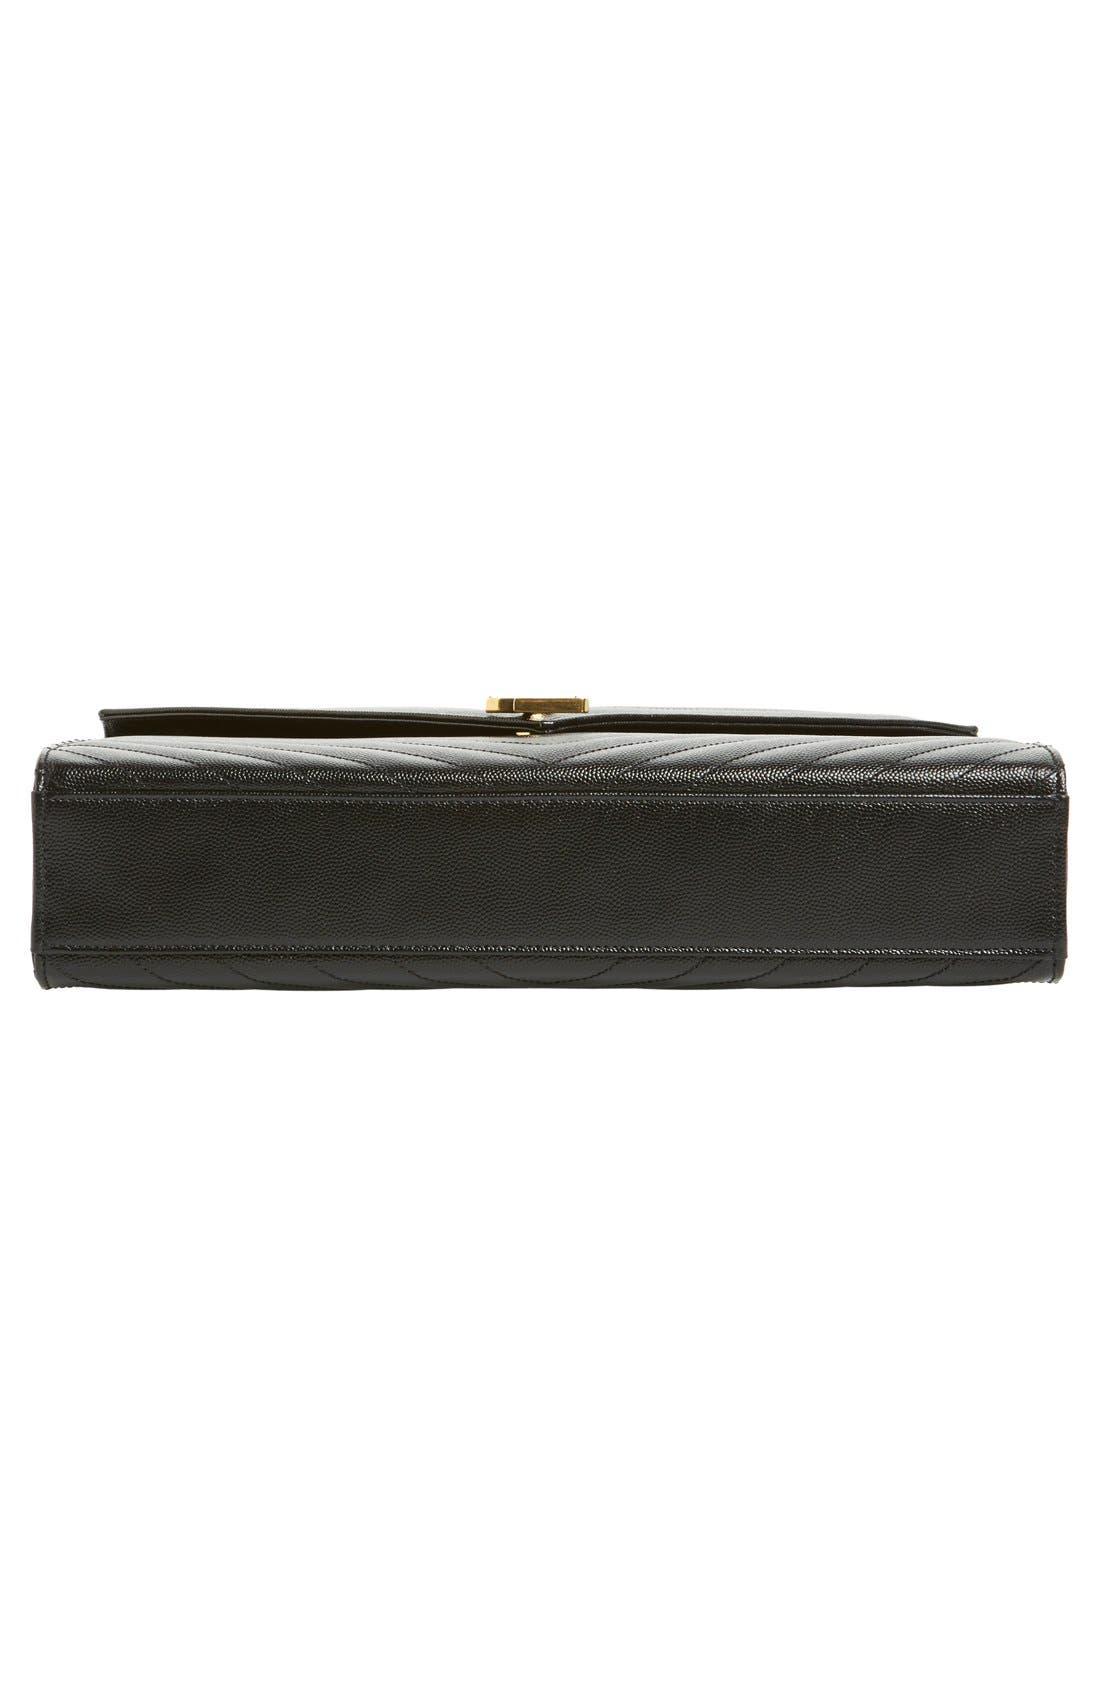 'Large Monogram' Grained Leather Shoulder Bag,                             Alternate thumbnail 6, color,                             Nero/ Gold Hdwr